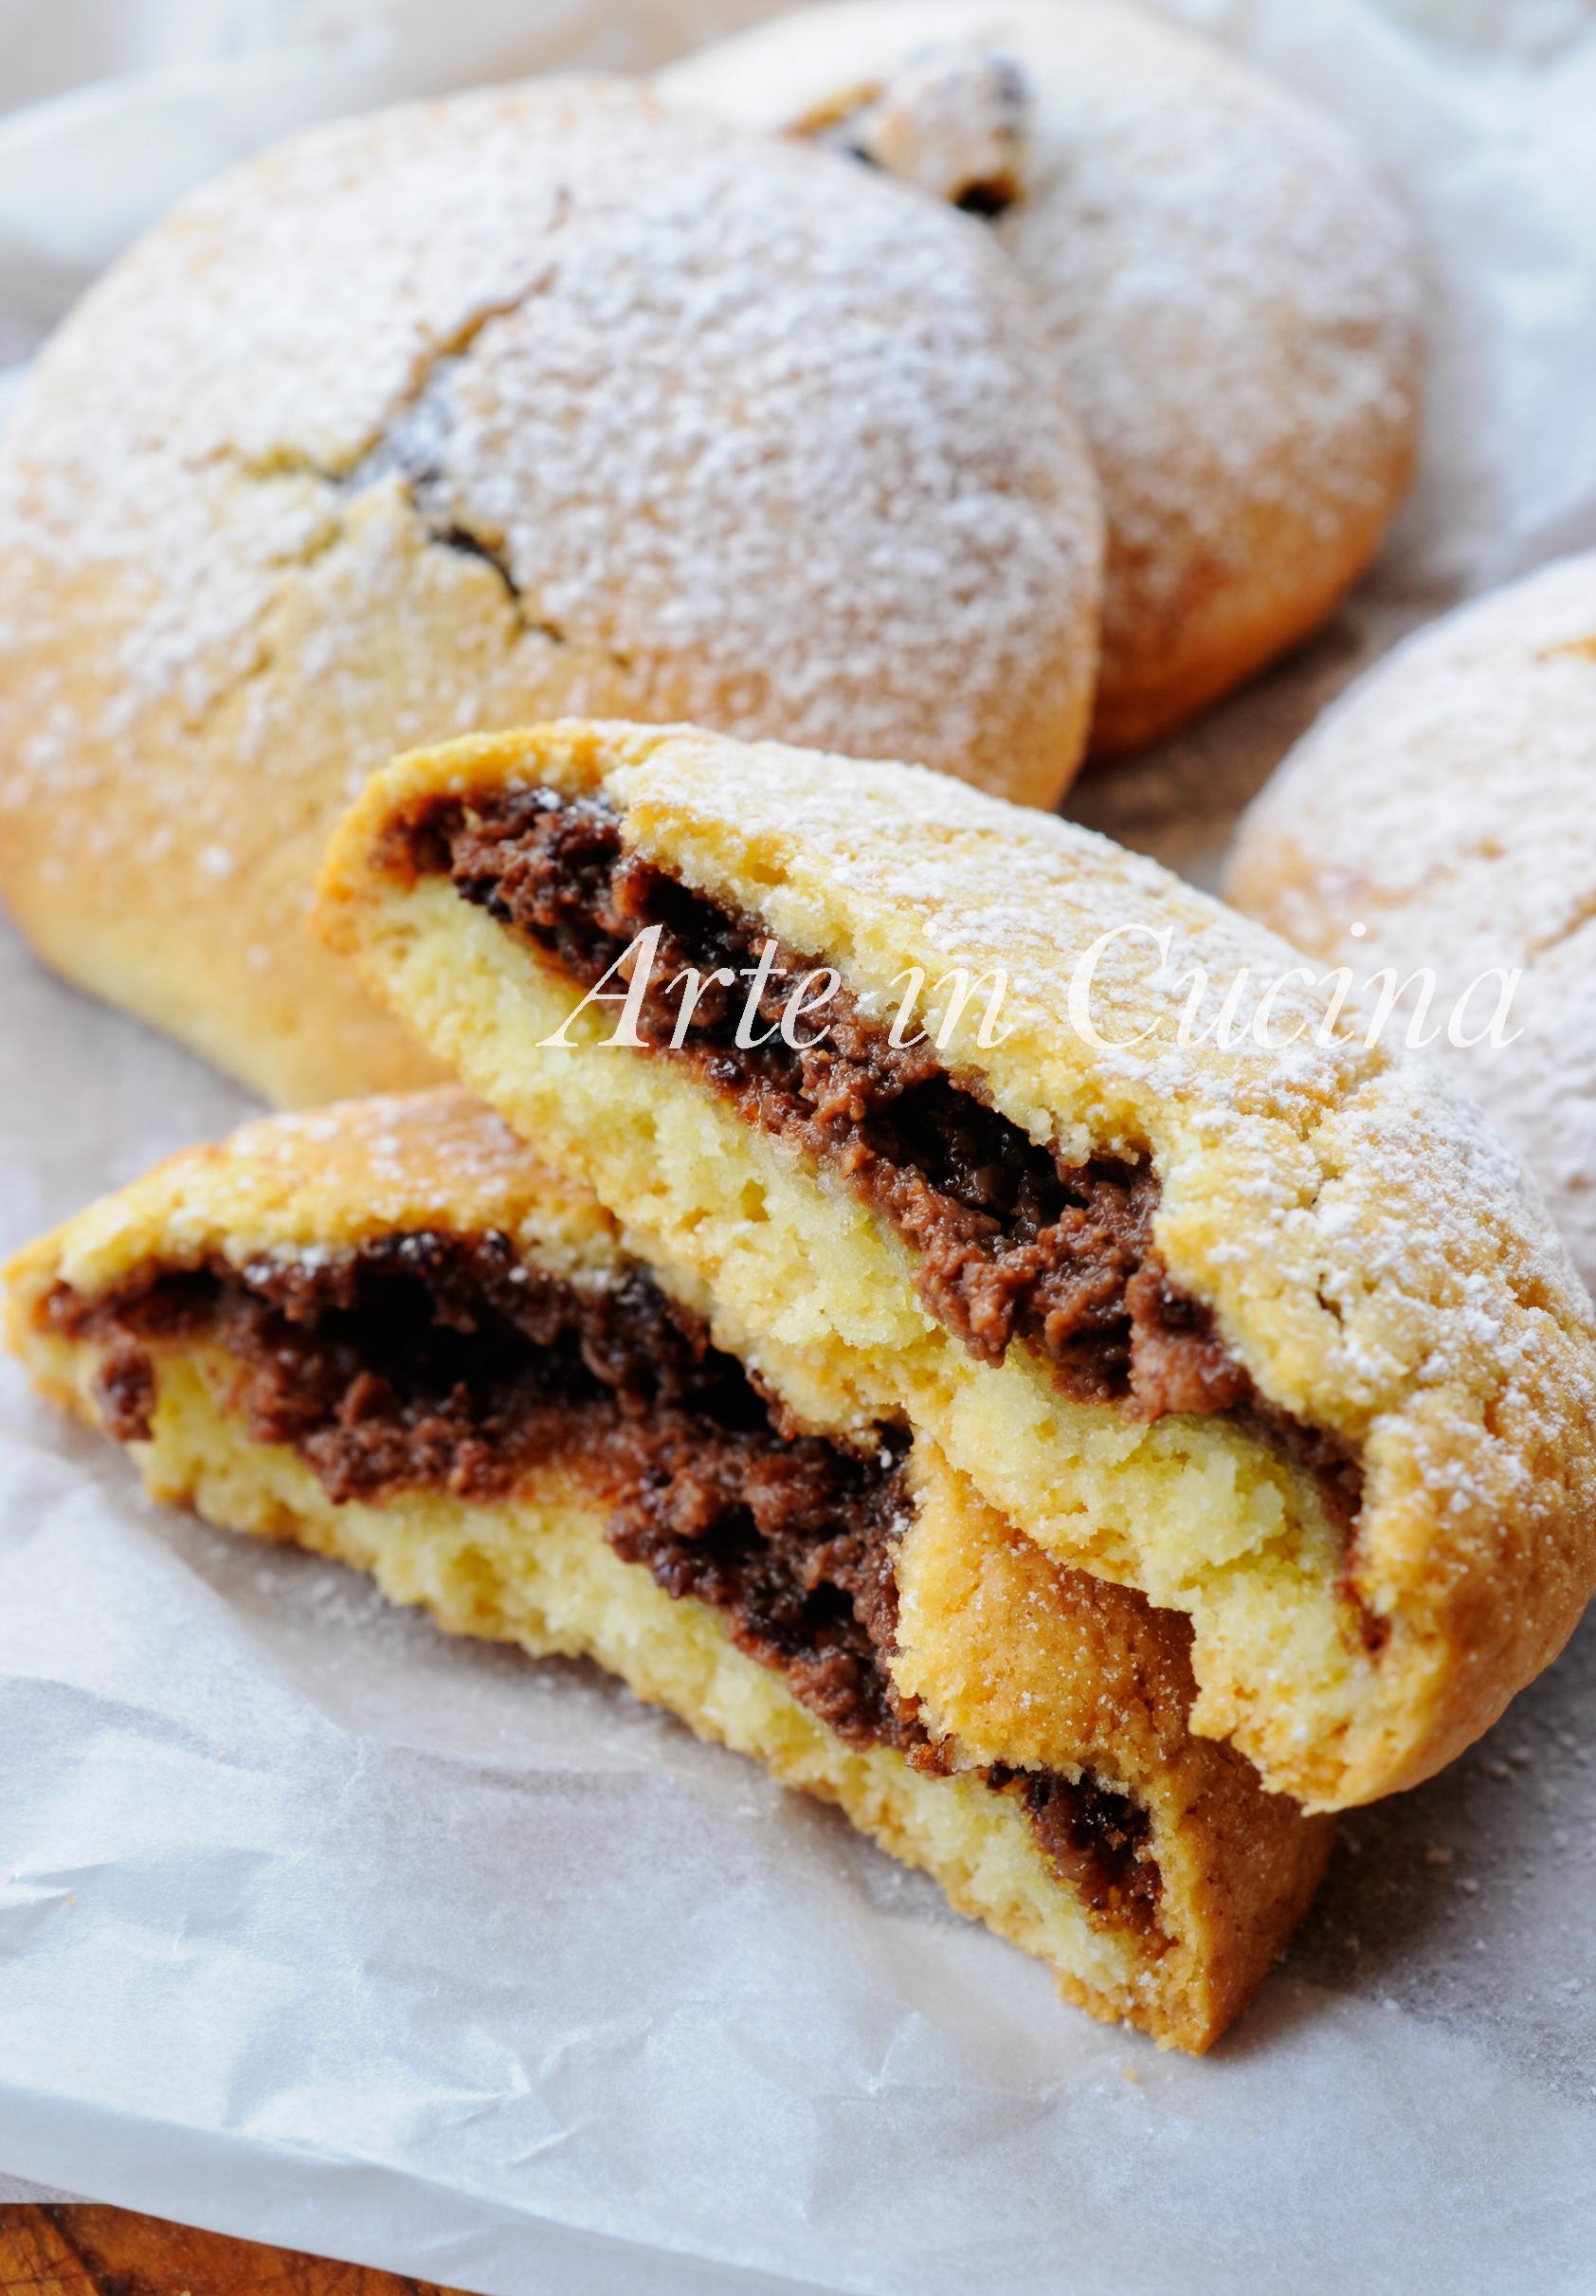 Frolle ricotta e nutella ricetta dolce veloce vickyart arte in cucina